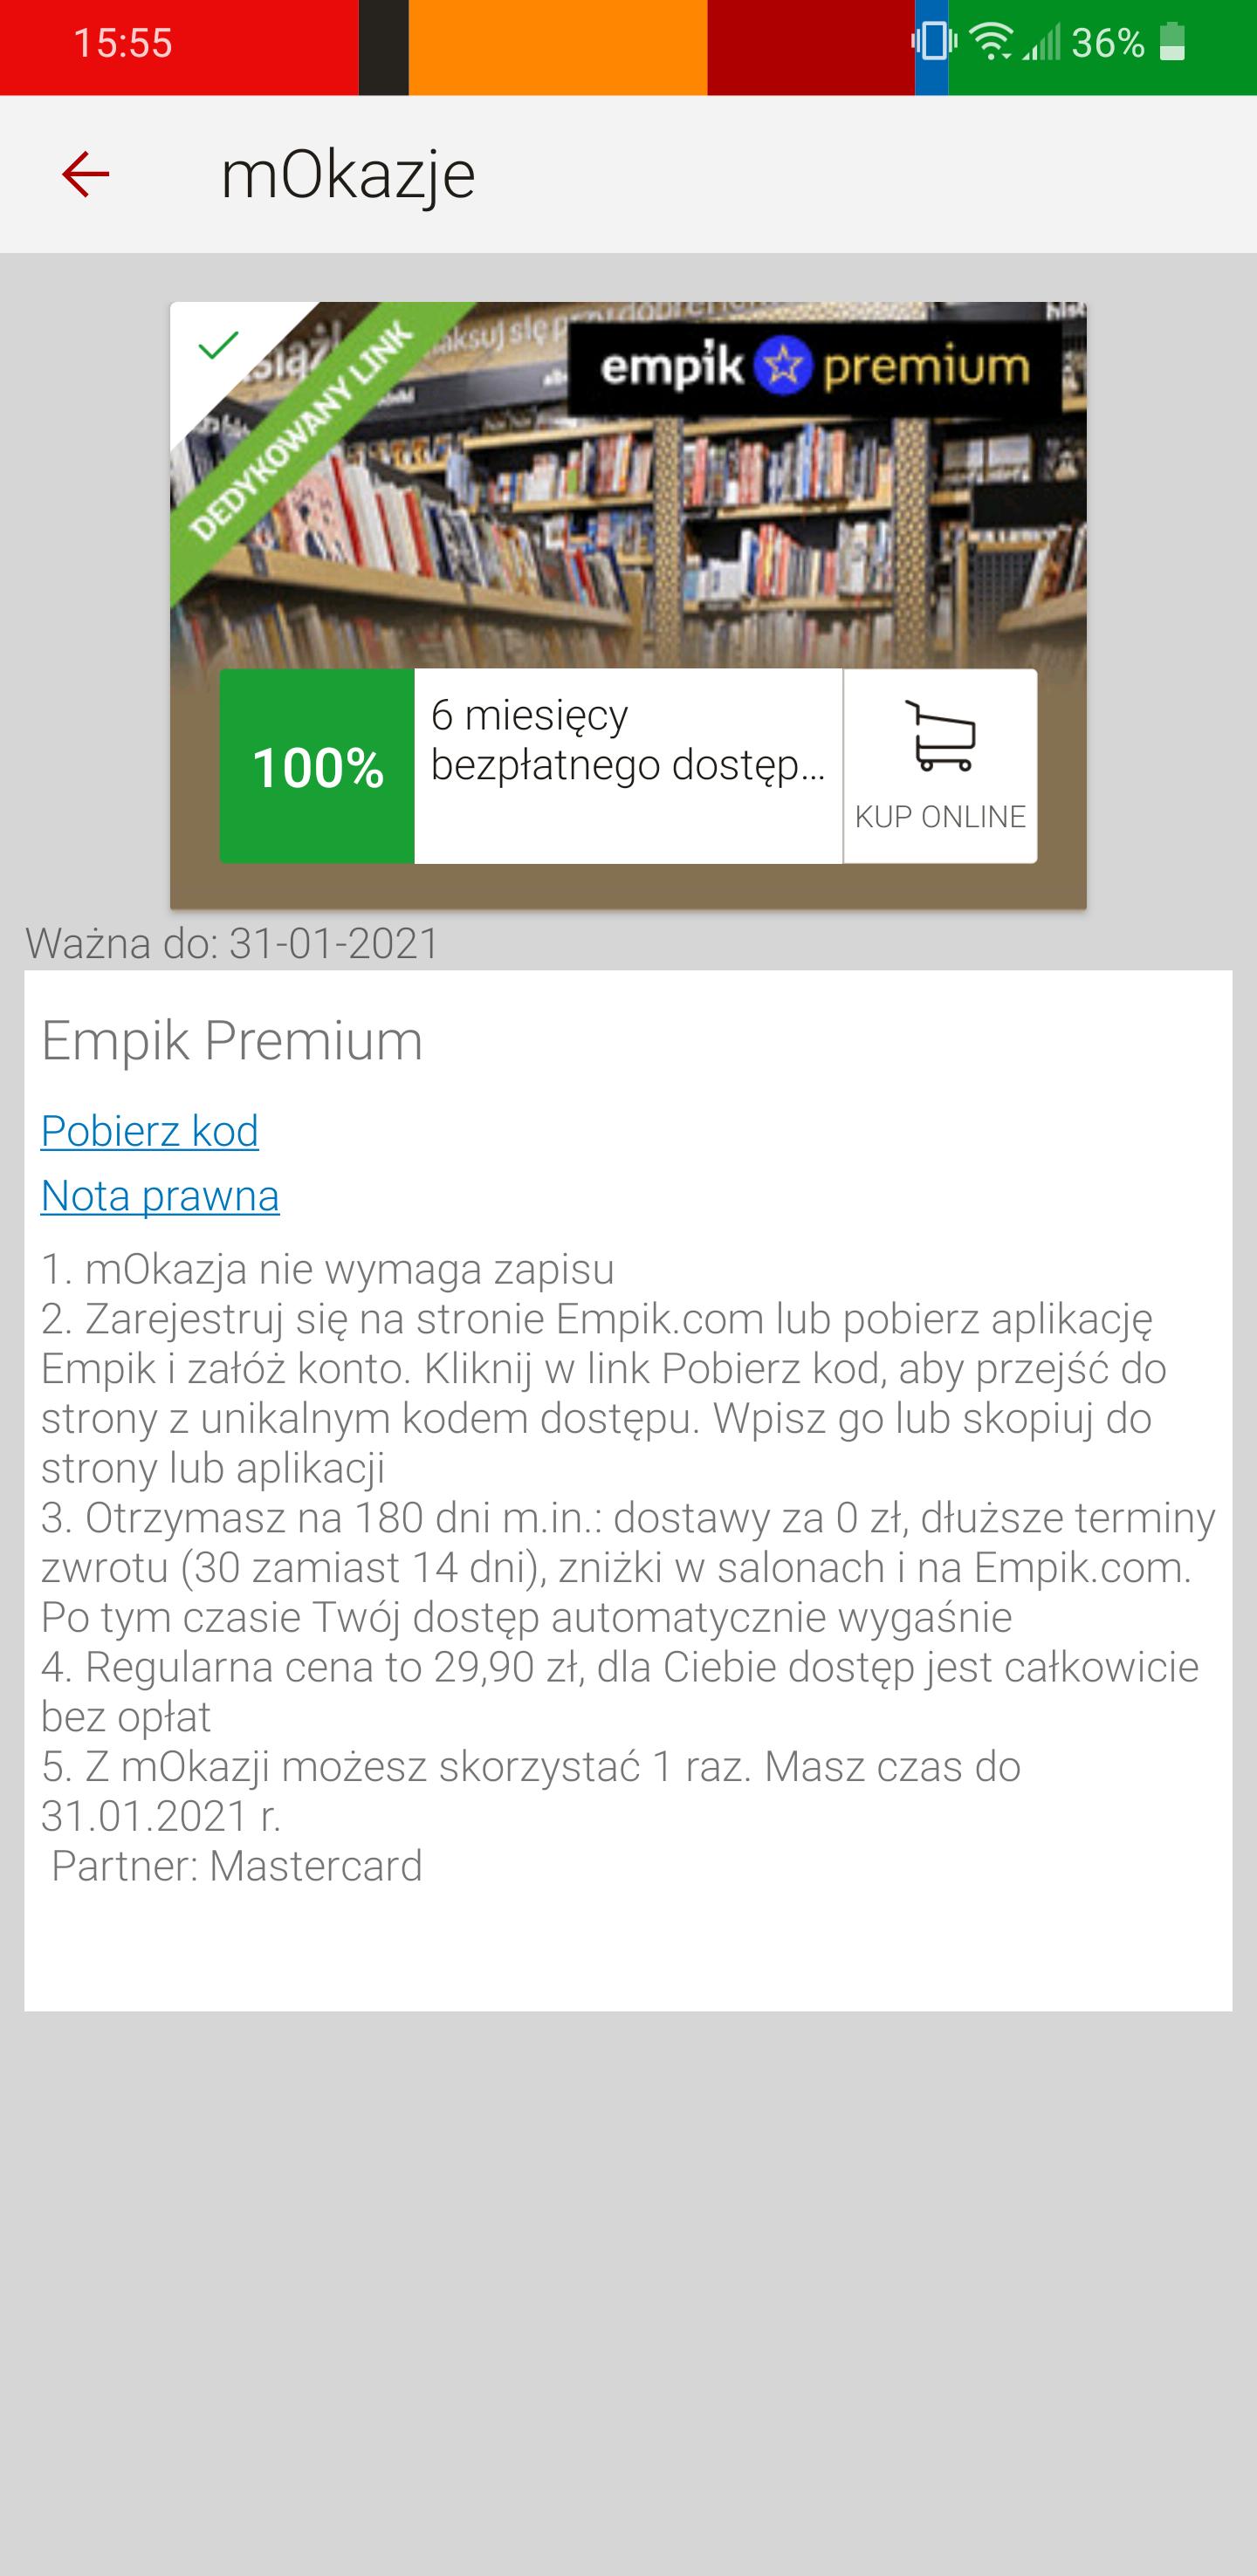 Empik premium 6 miesięcy za darmo mOkazja mBank